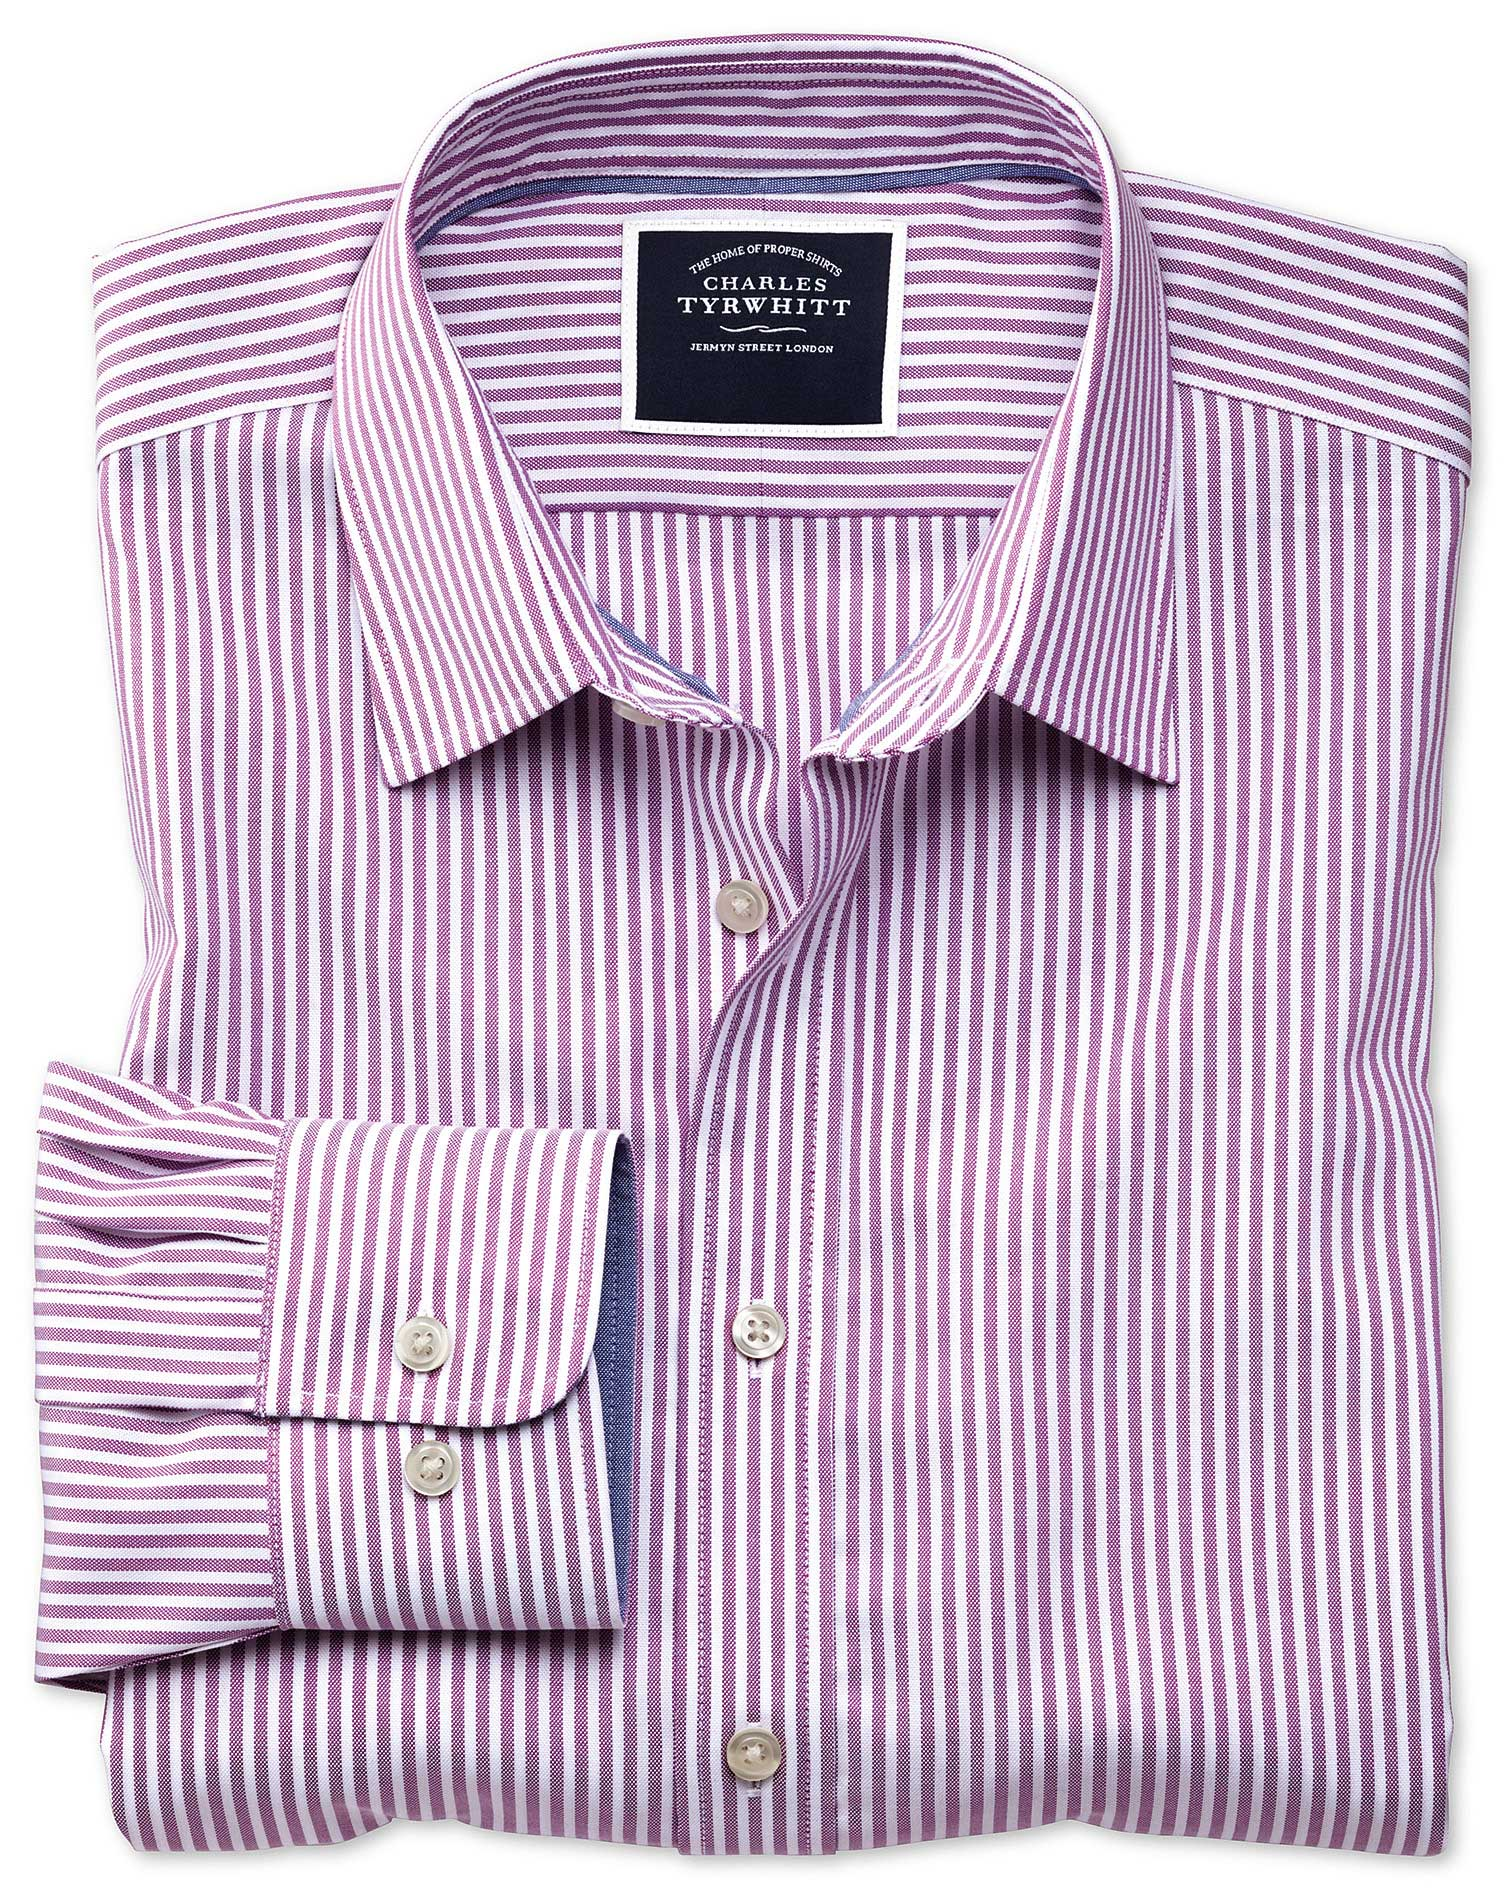 slim fit non-iron purple bengal stripe oxford cotton casual shirt single cuff size xs by charles tyrwhitt